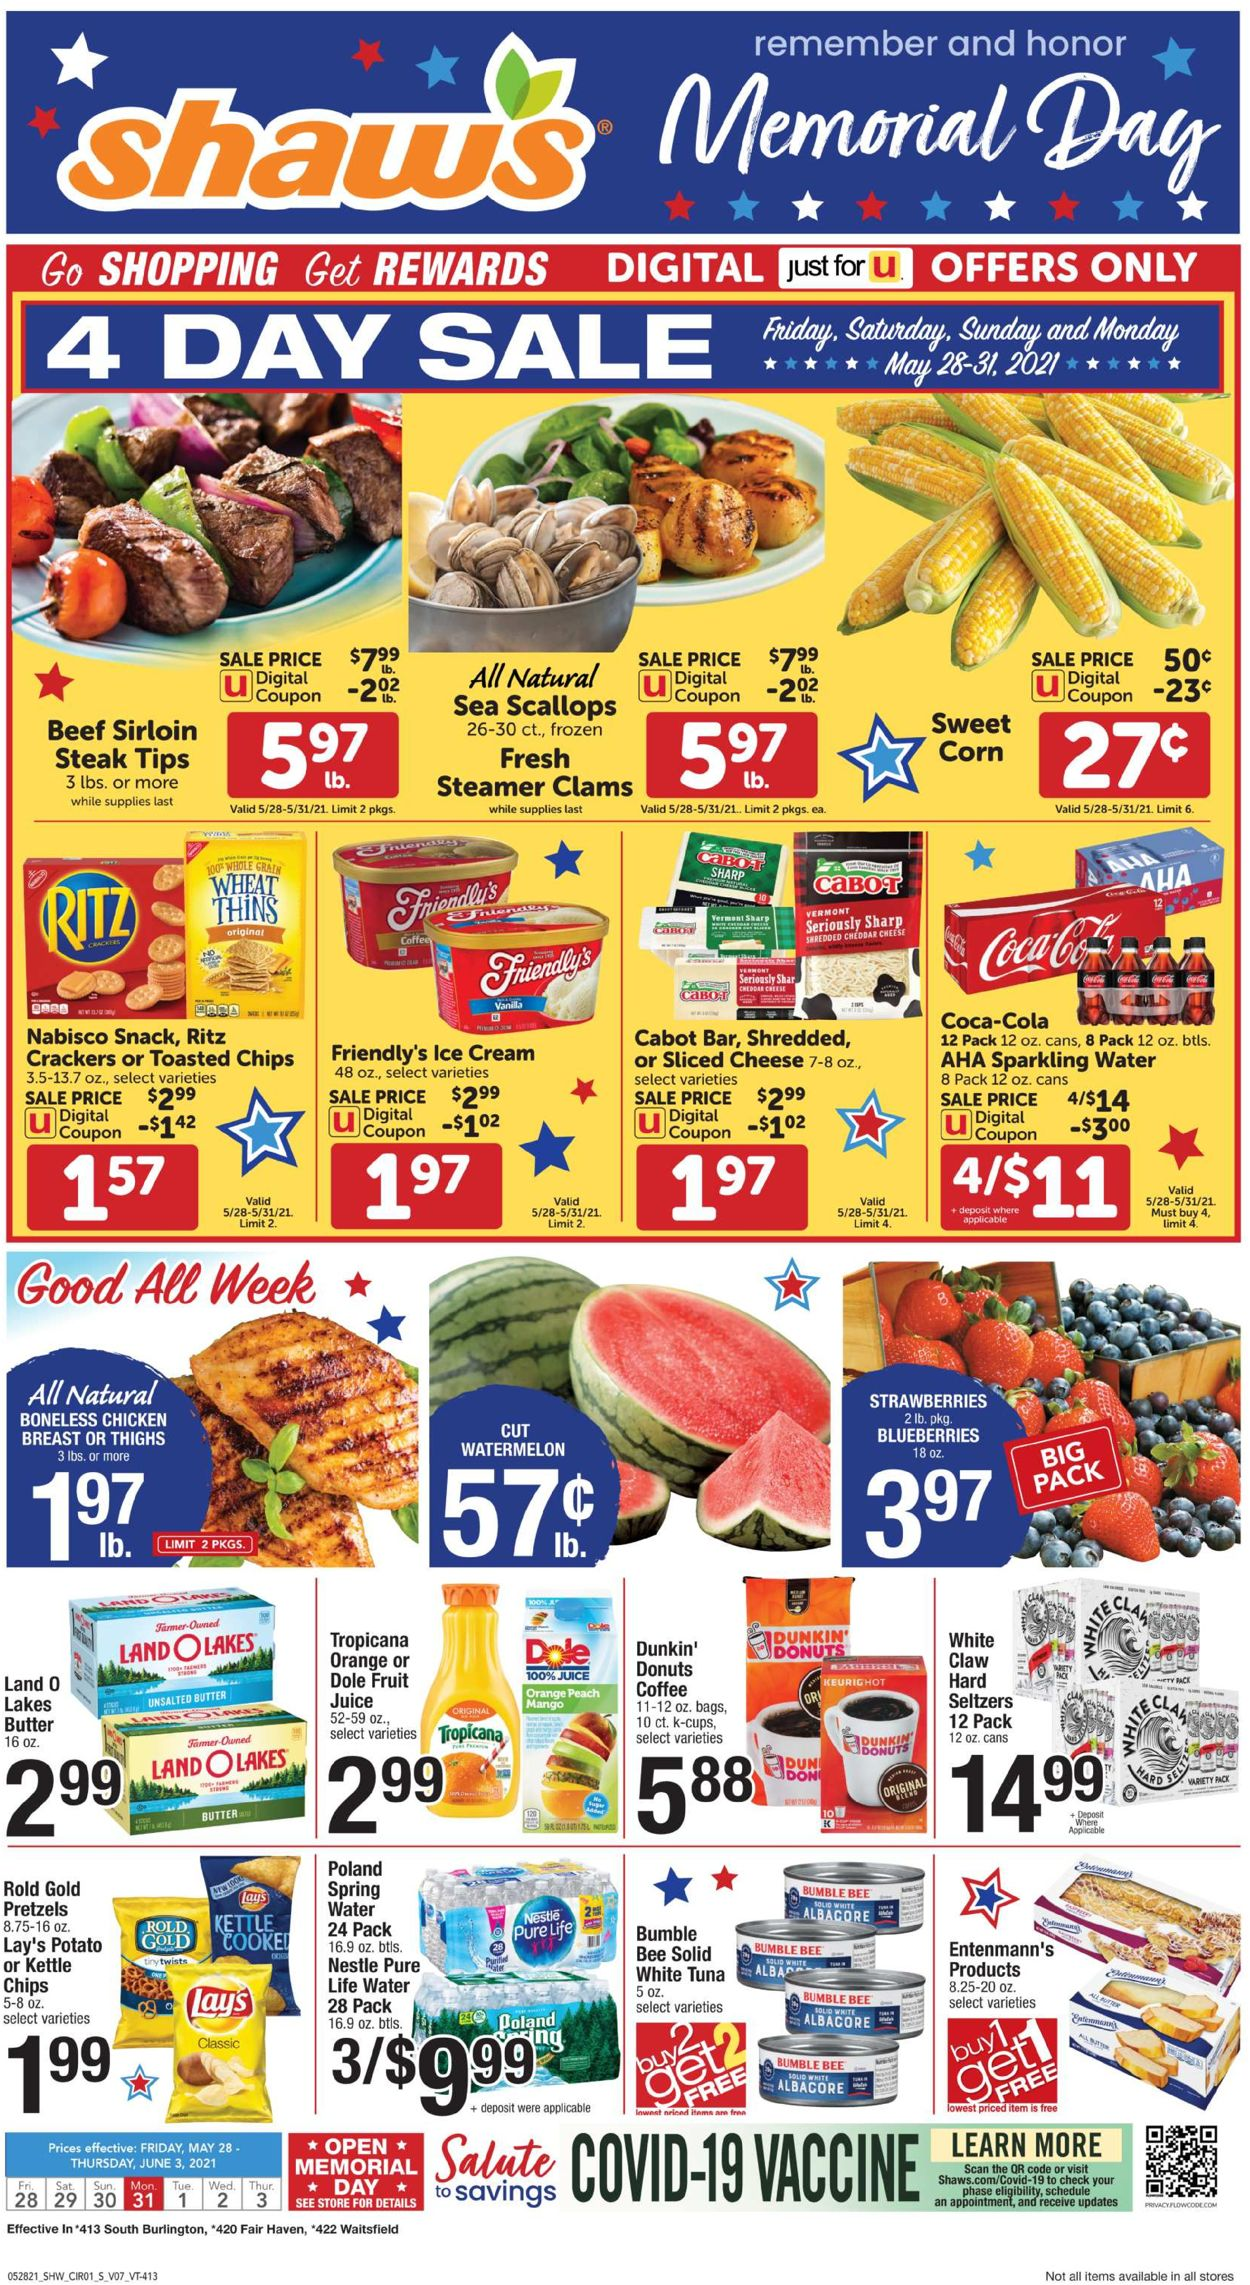 Shaw's Weekly Ad Circular - valid 05/28-06/03/2021